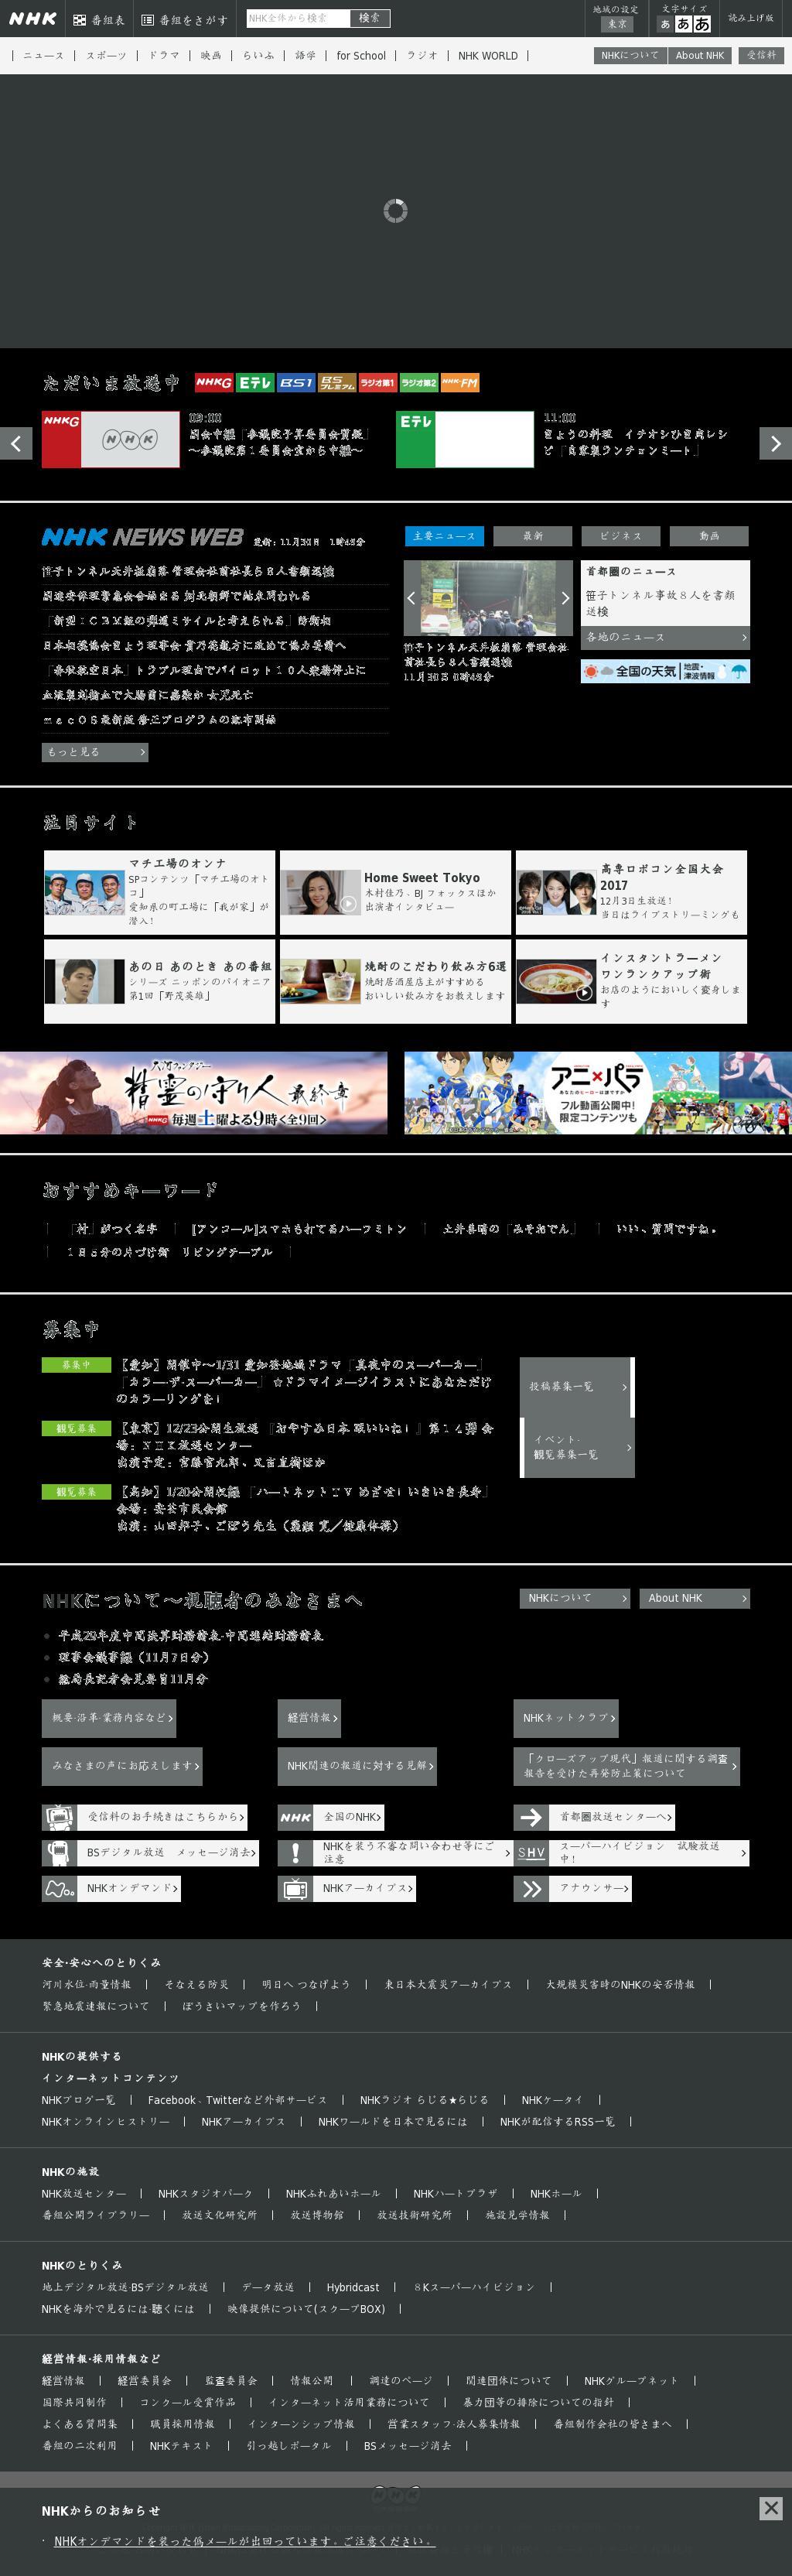 NHK Online at Monday March 12, 2018, 4:15 a.m. UTC